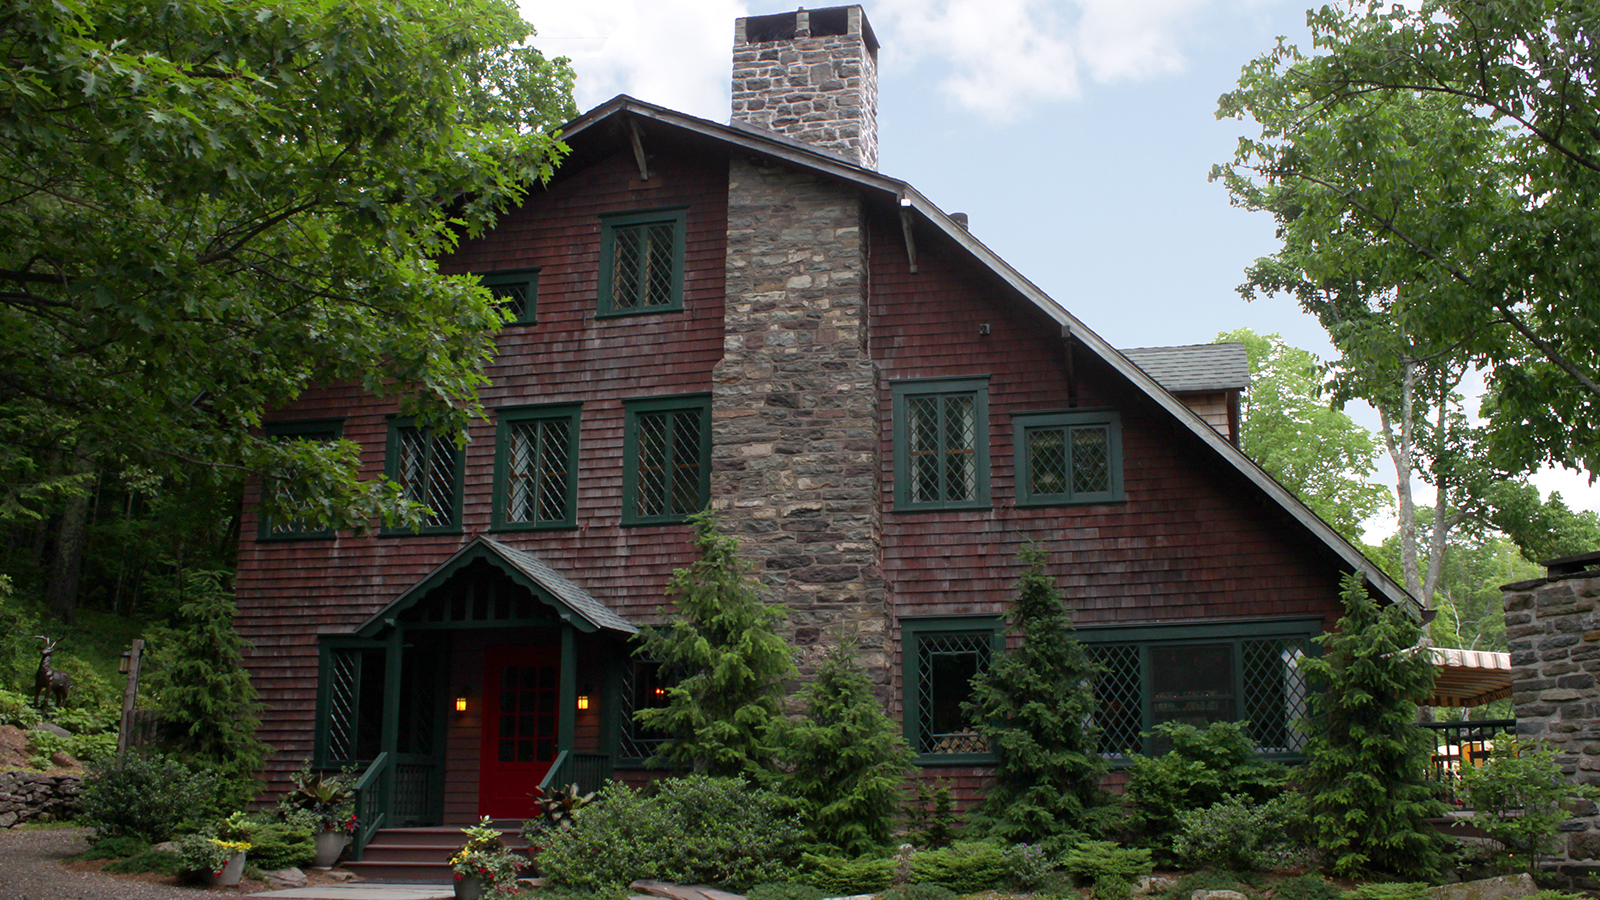 Catskills see big revival as New York vacation spot | CNN Travel